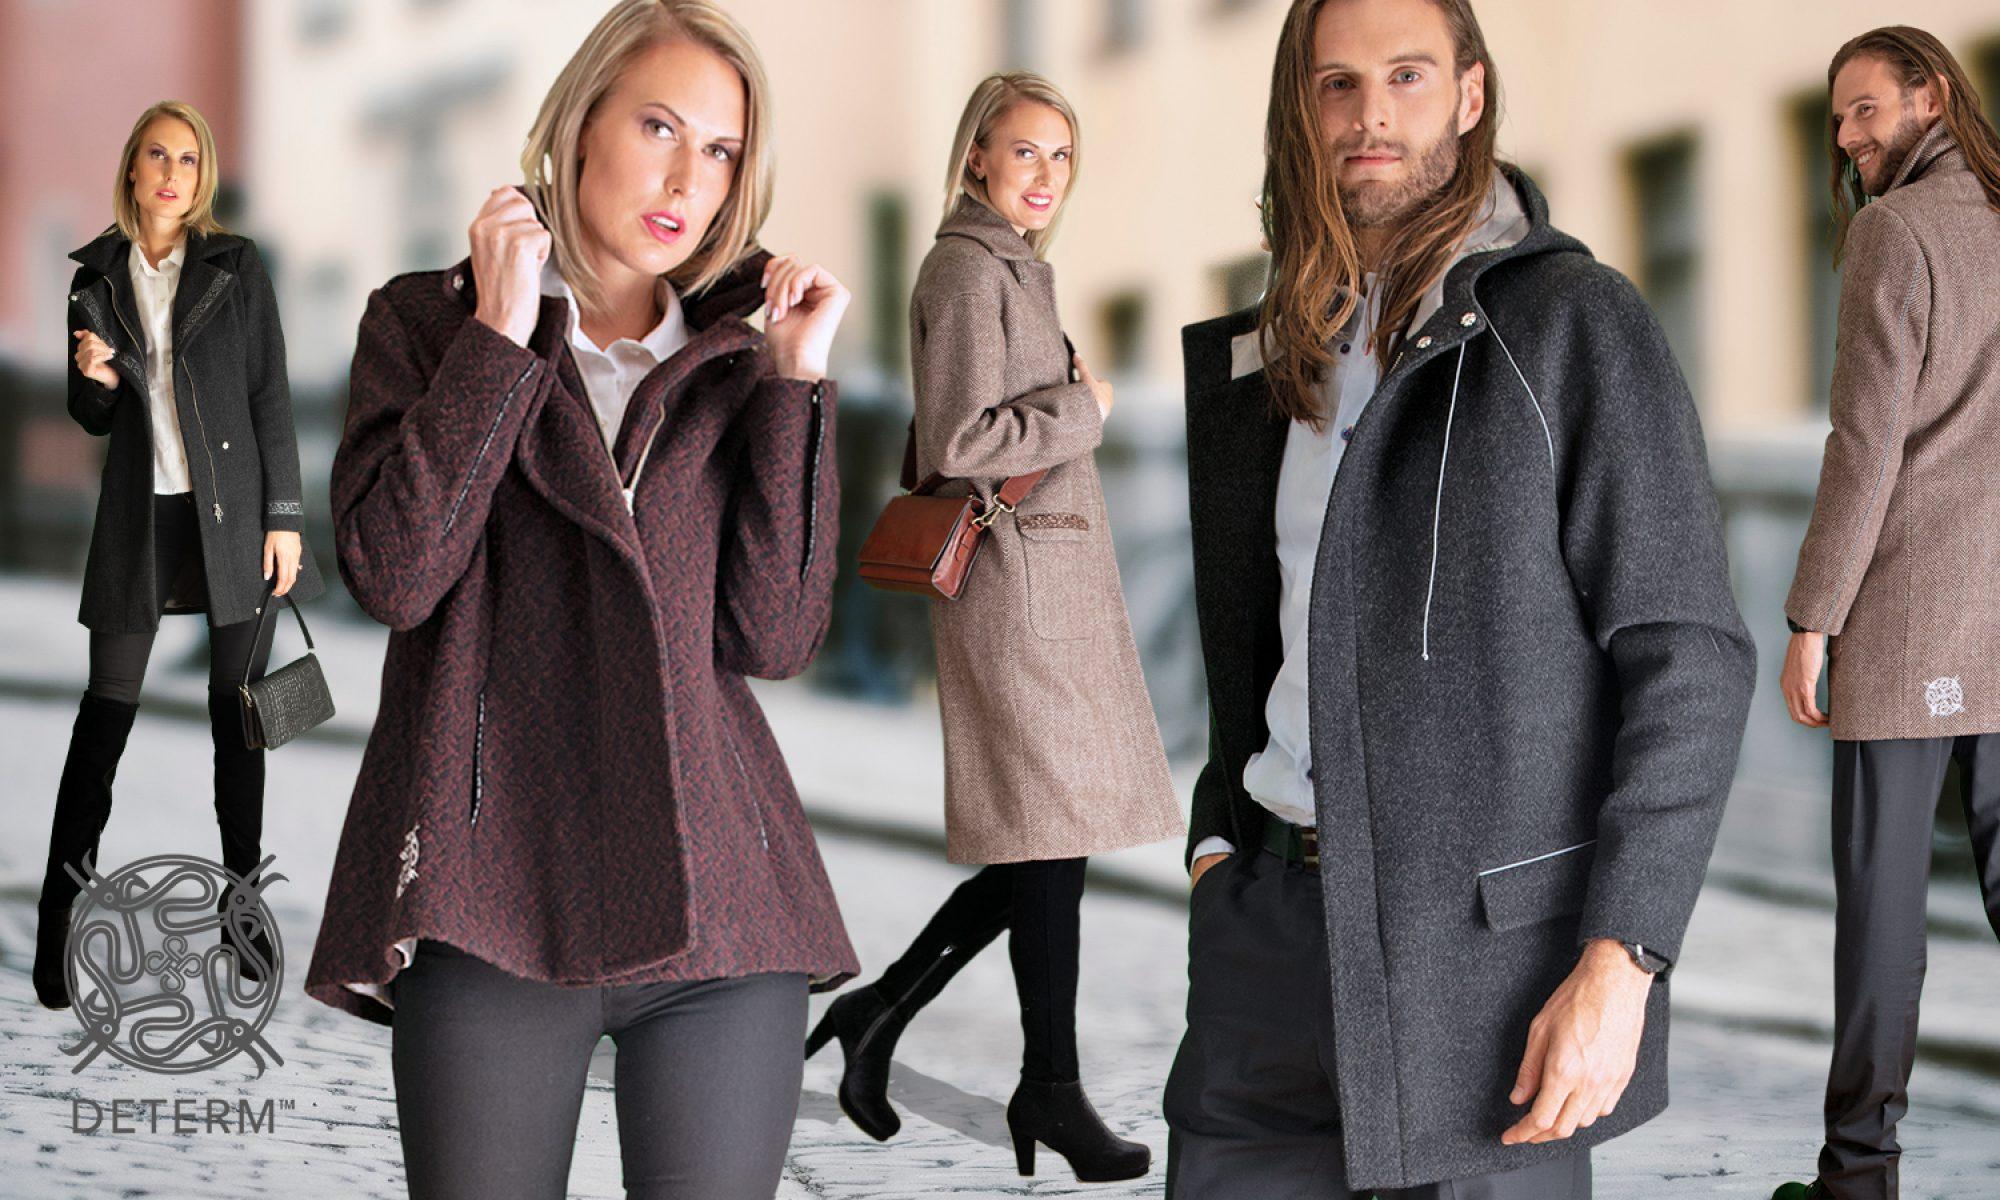 DeTerm™ coats and clothing – Ecologic, beautiful, high